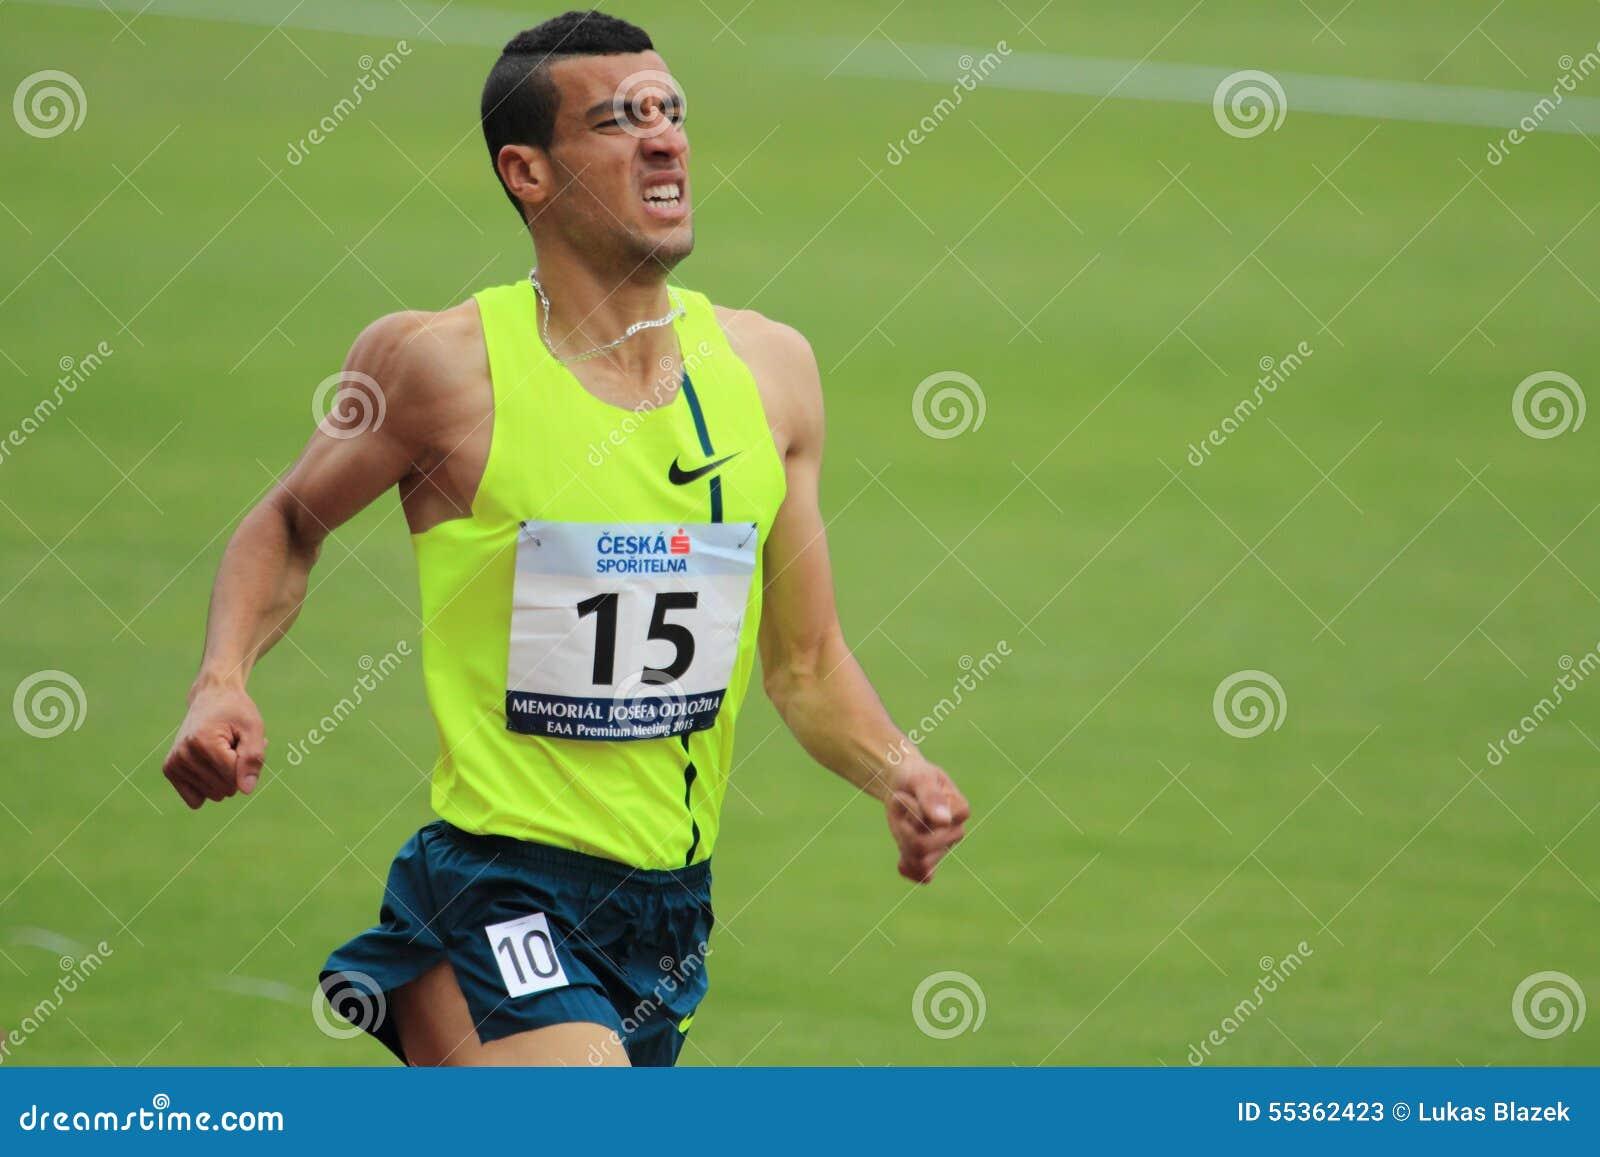 Yassine Hathat - atletica